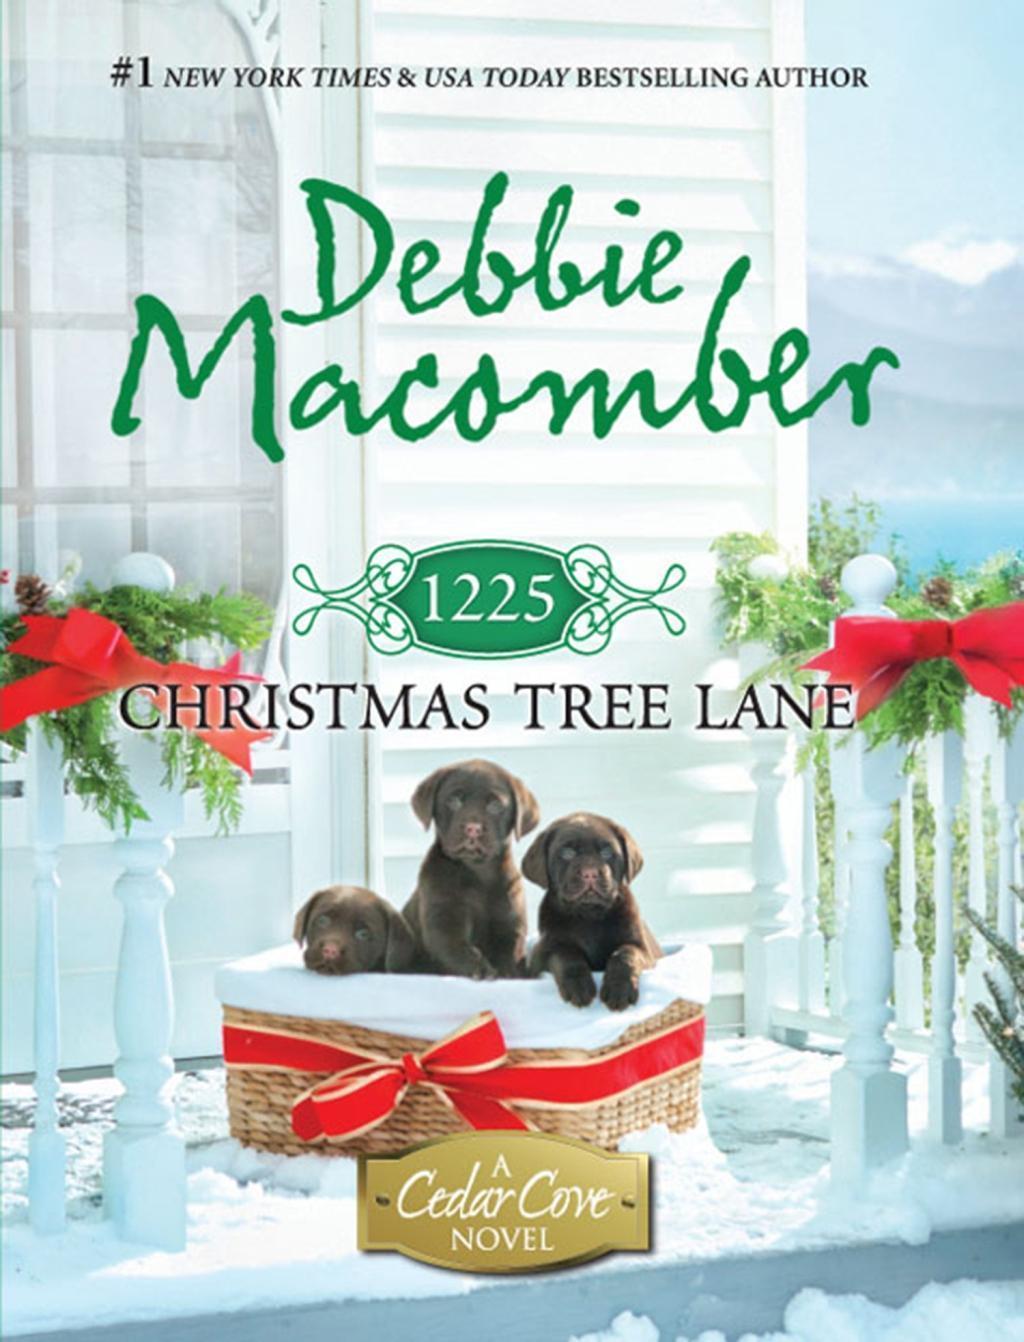 1225 Christmas Tree Lane (A Cedar Cove Novel, Book 12)